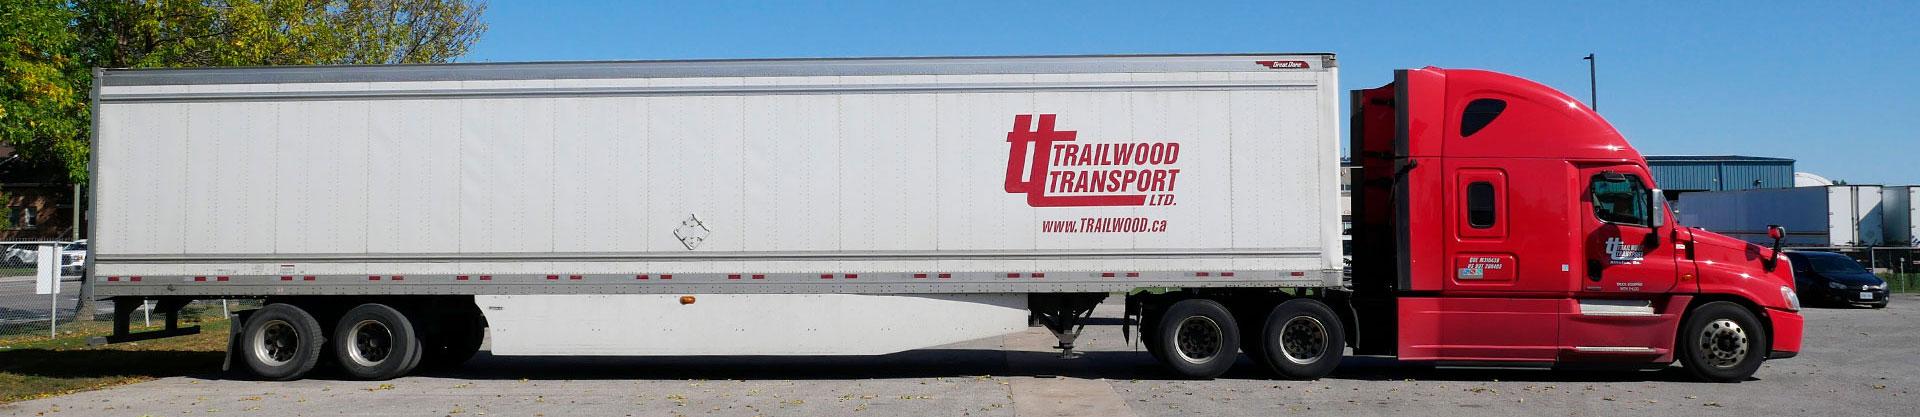 Trailwood-banner-2